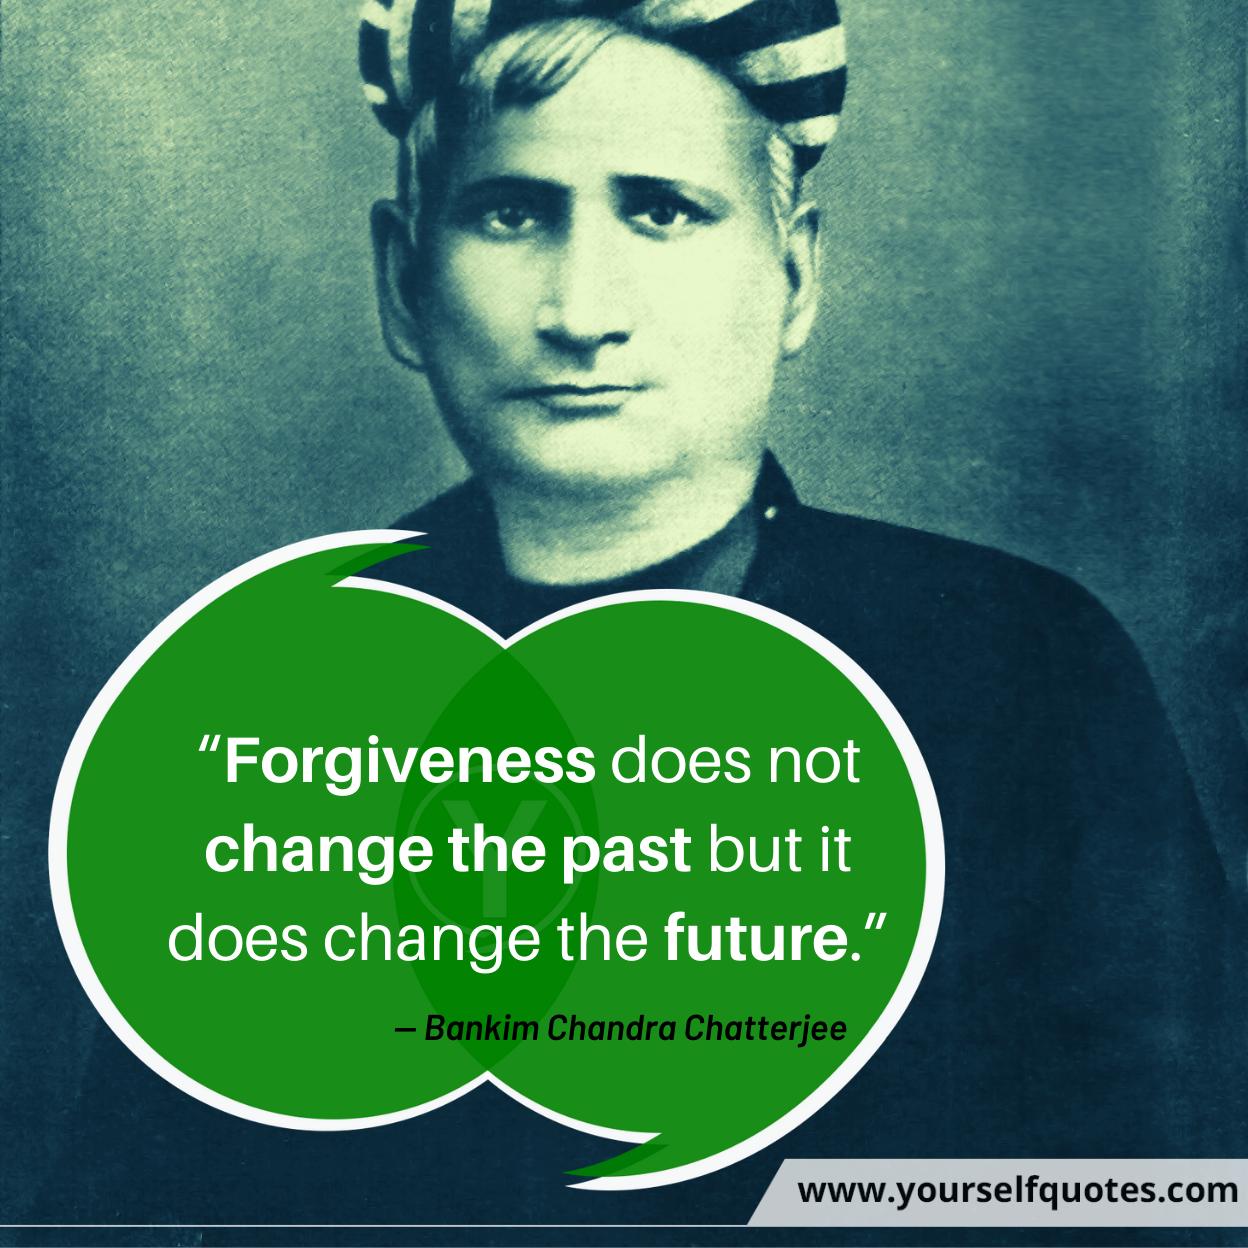 Quotes Bankim Chandra Chatterjee